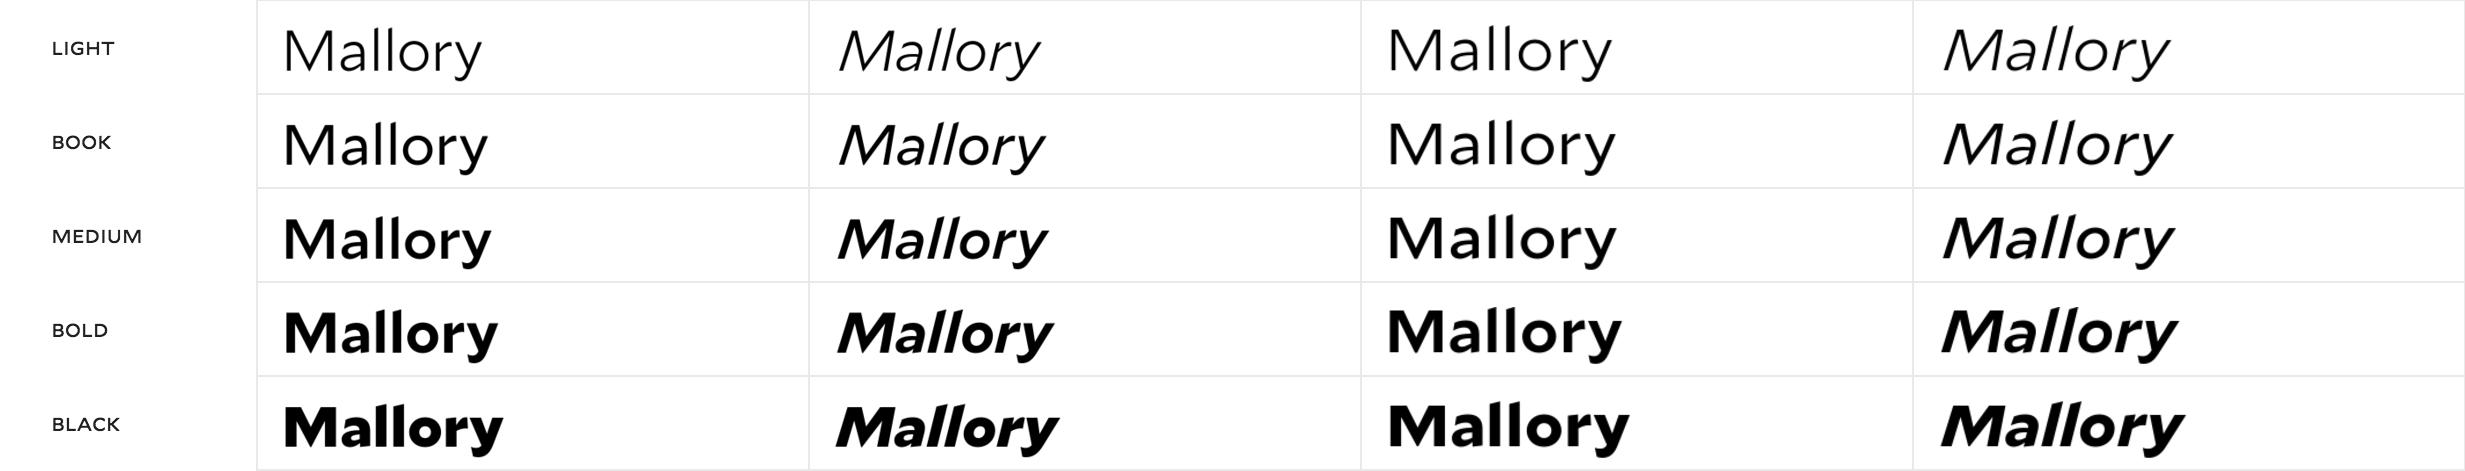 screencapture-frerejones-com-families-mallory-1452515885020